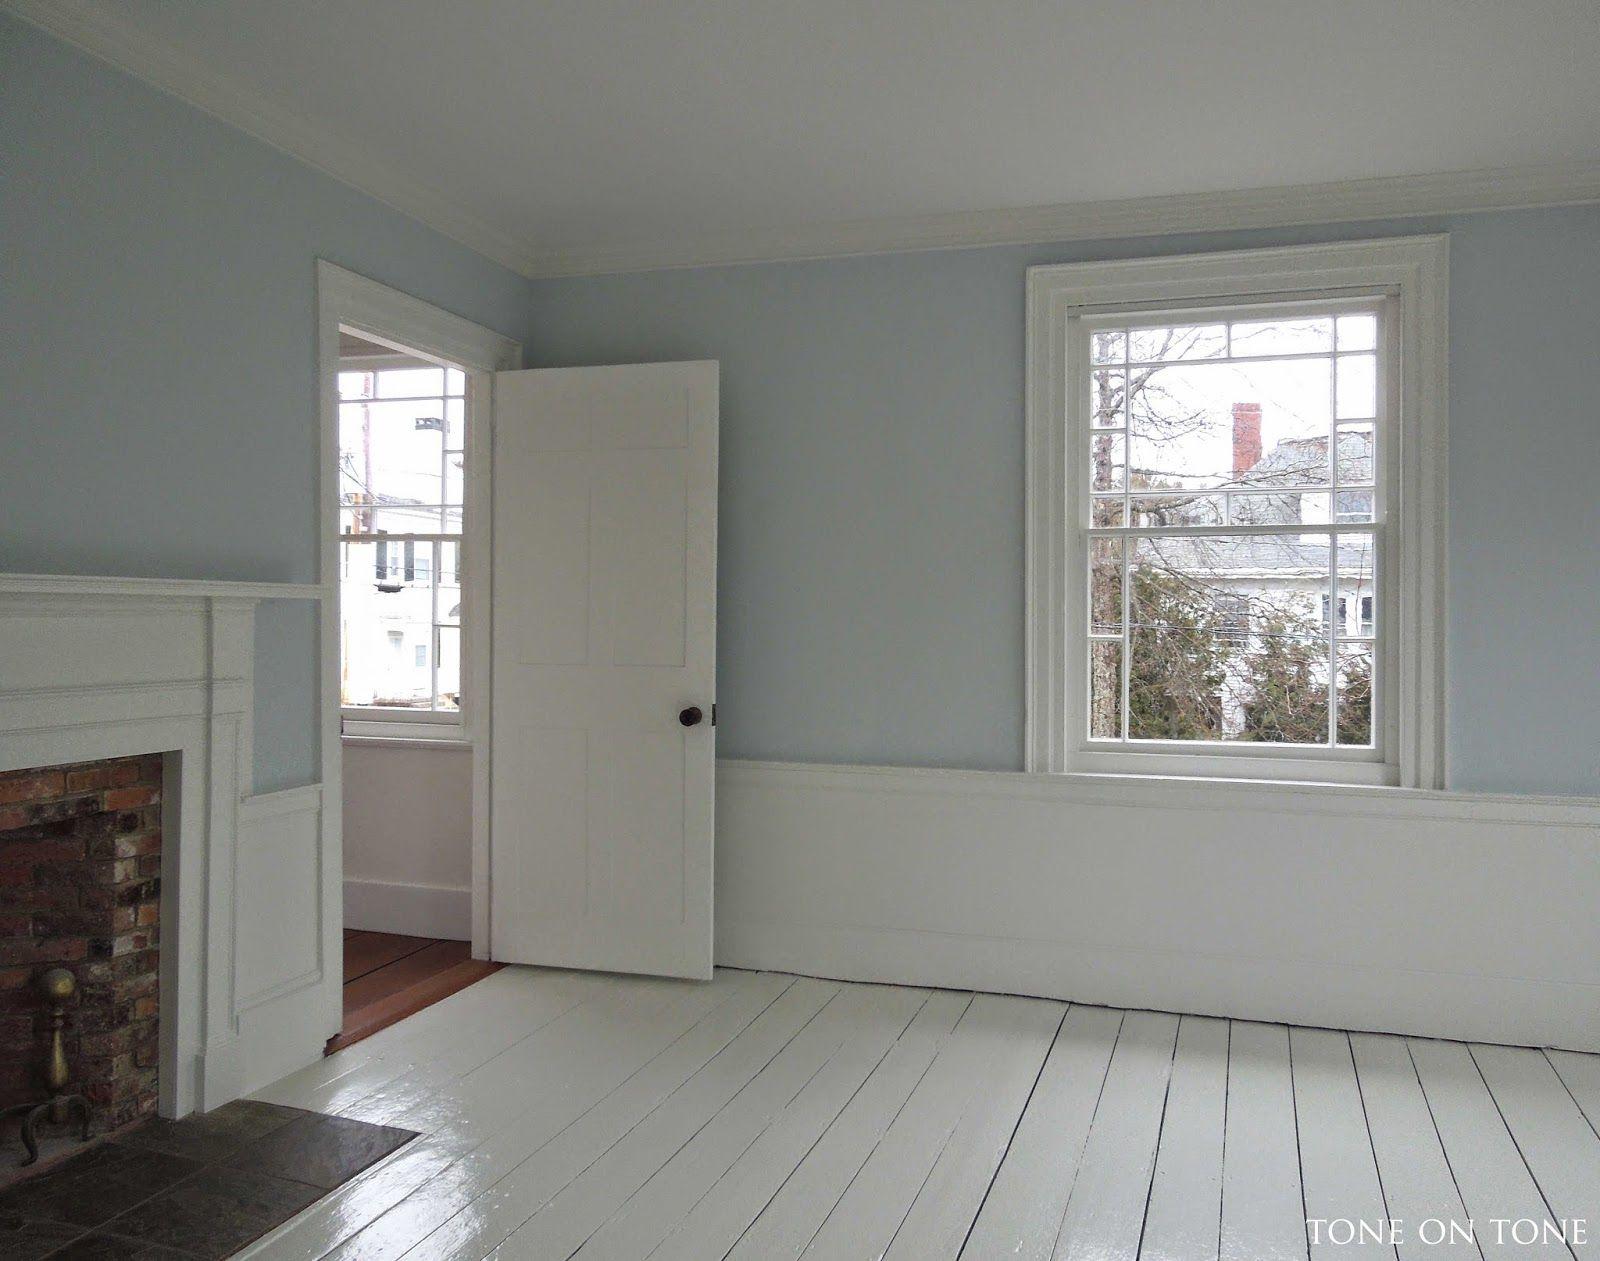 walls: benjamin moore gray sky - a true sky blue. this room gets